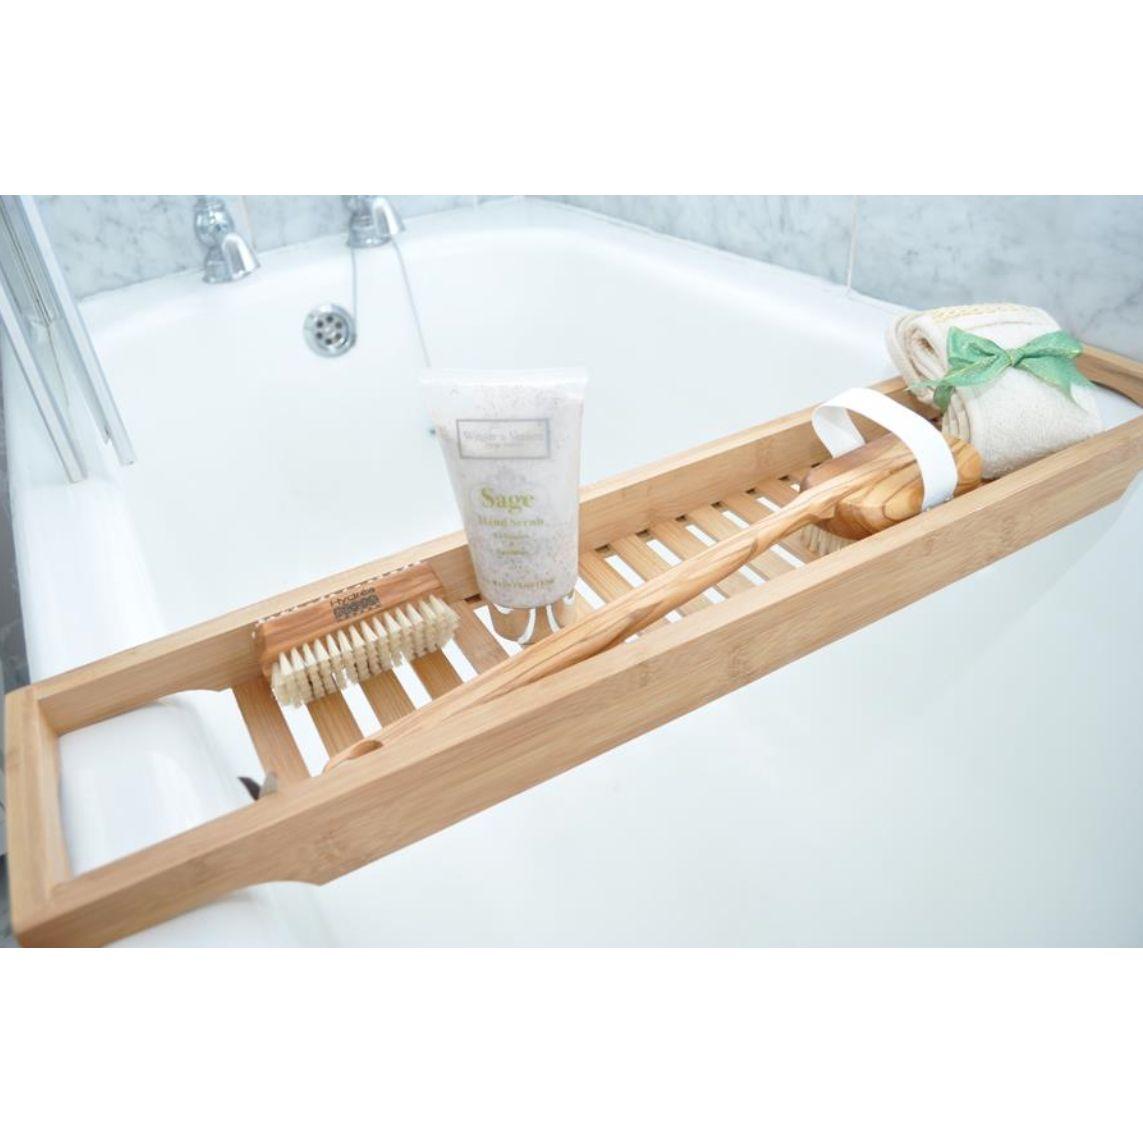 bath bridge bathtub soap holder slim bamboo bathroom accessories storage httpwww - Wooden Bathroom Accessories Uk